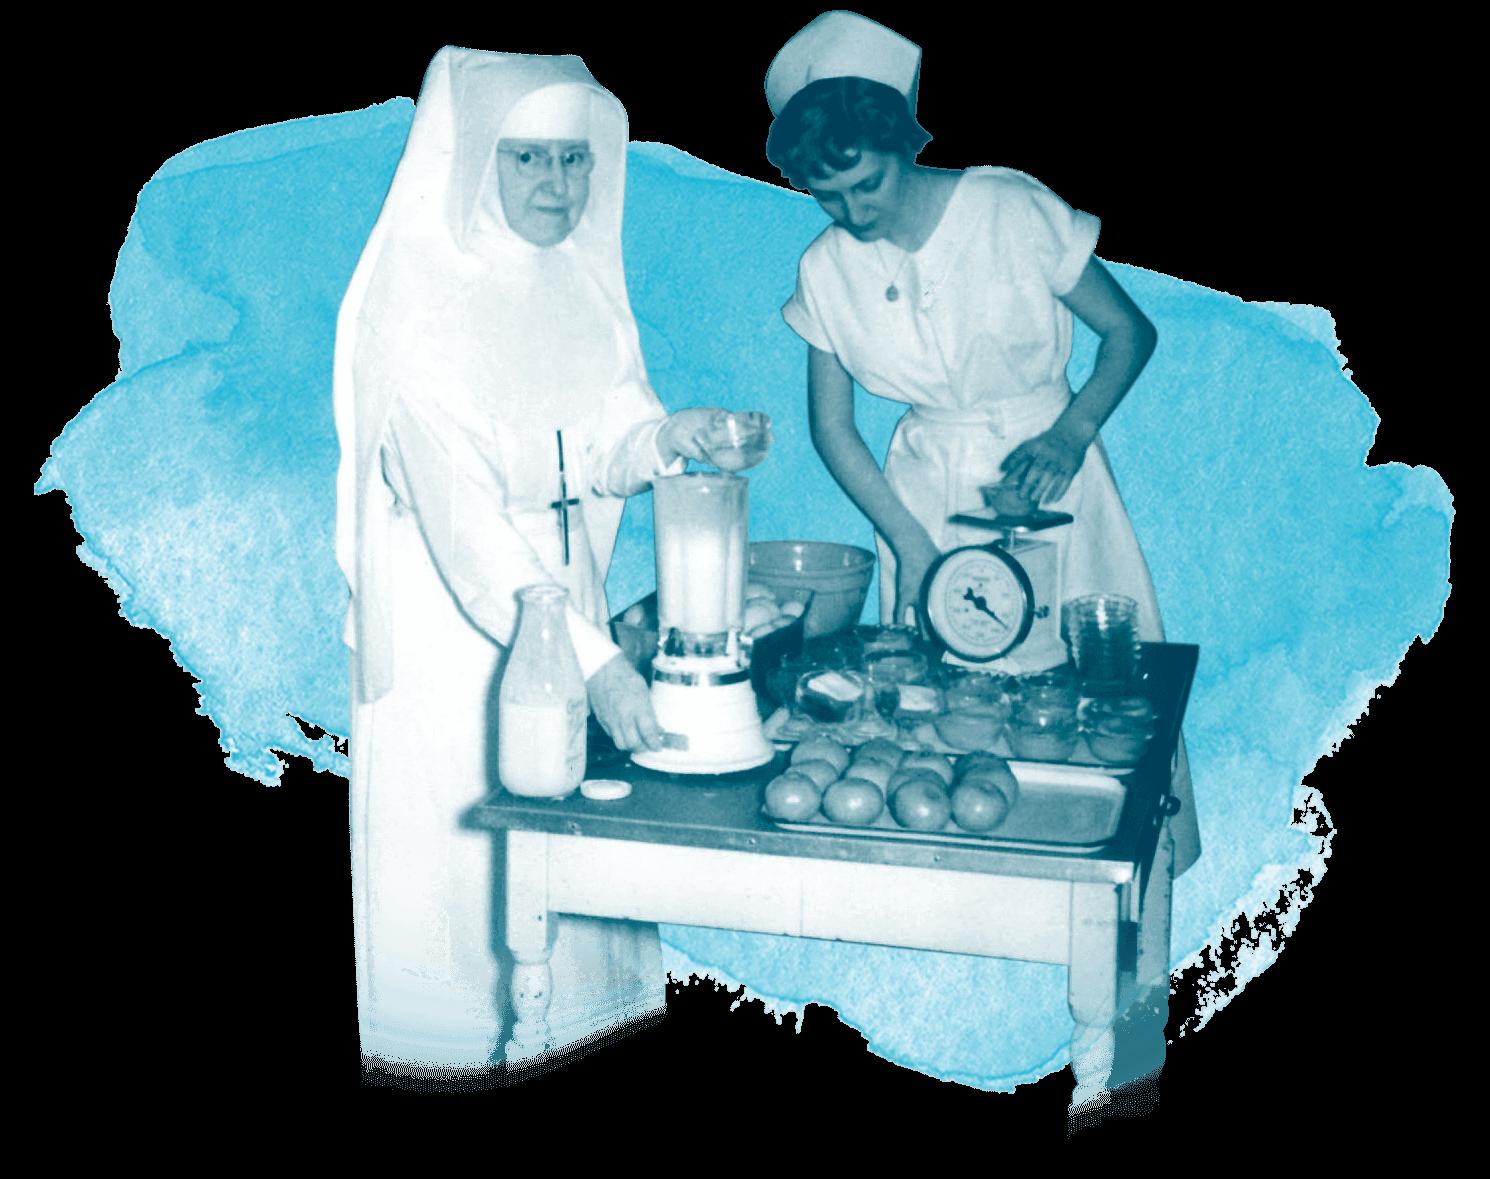 Nun and Nurse preparing food